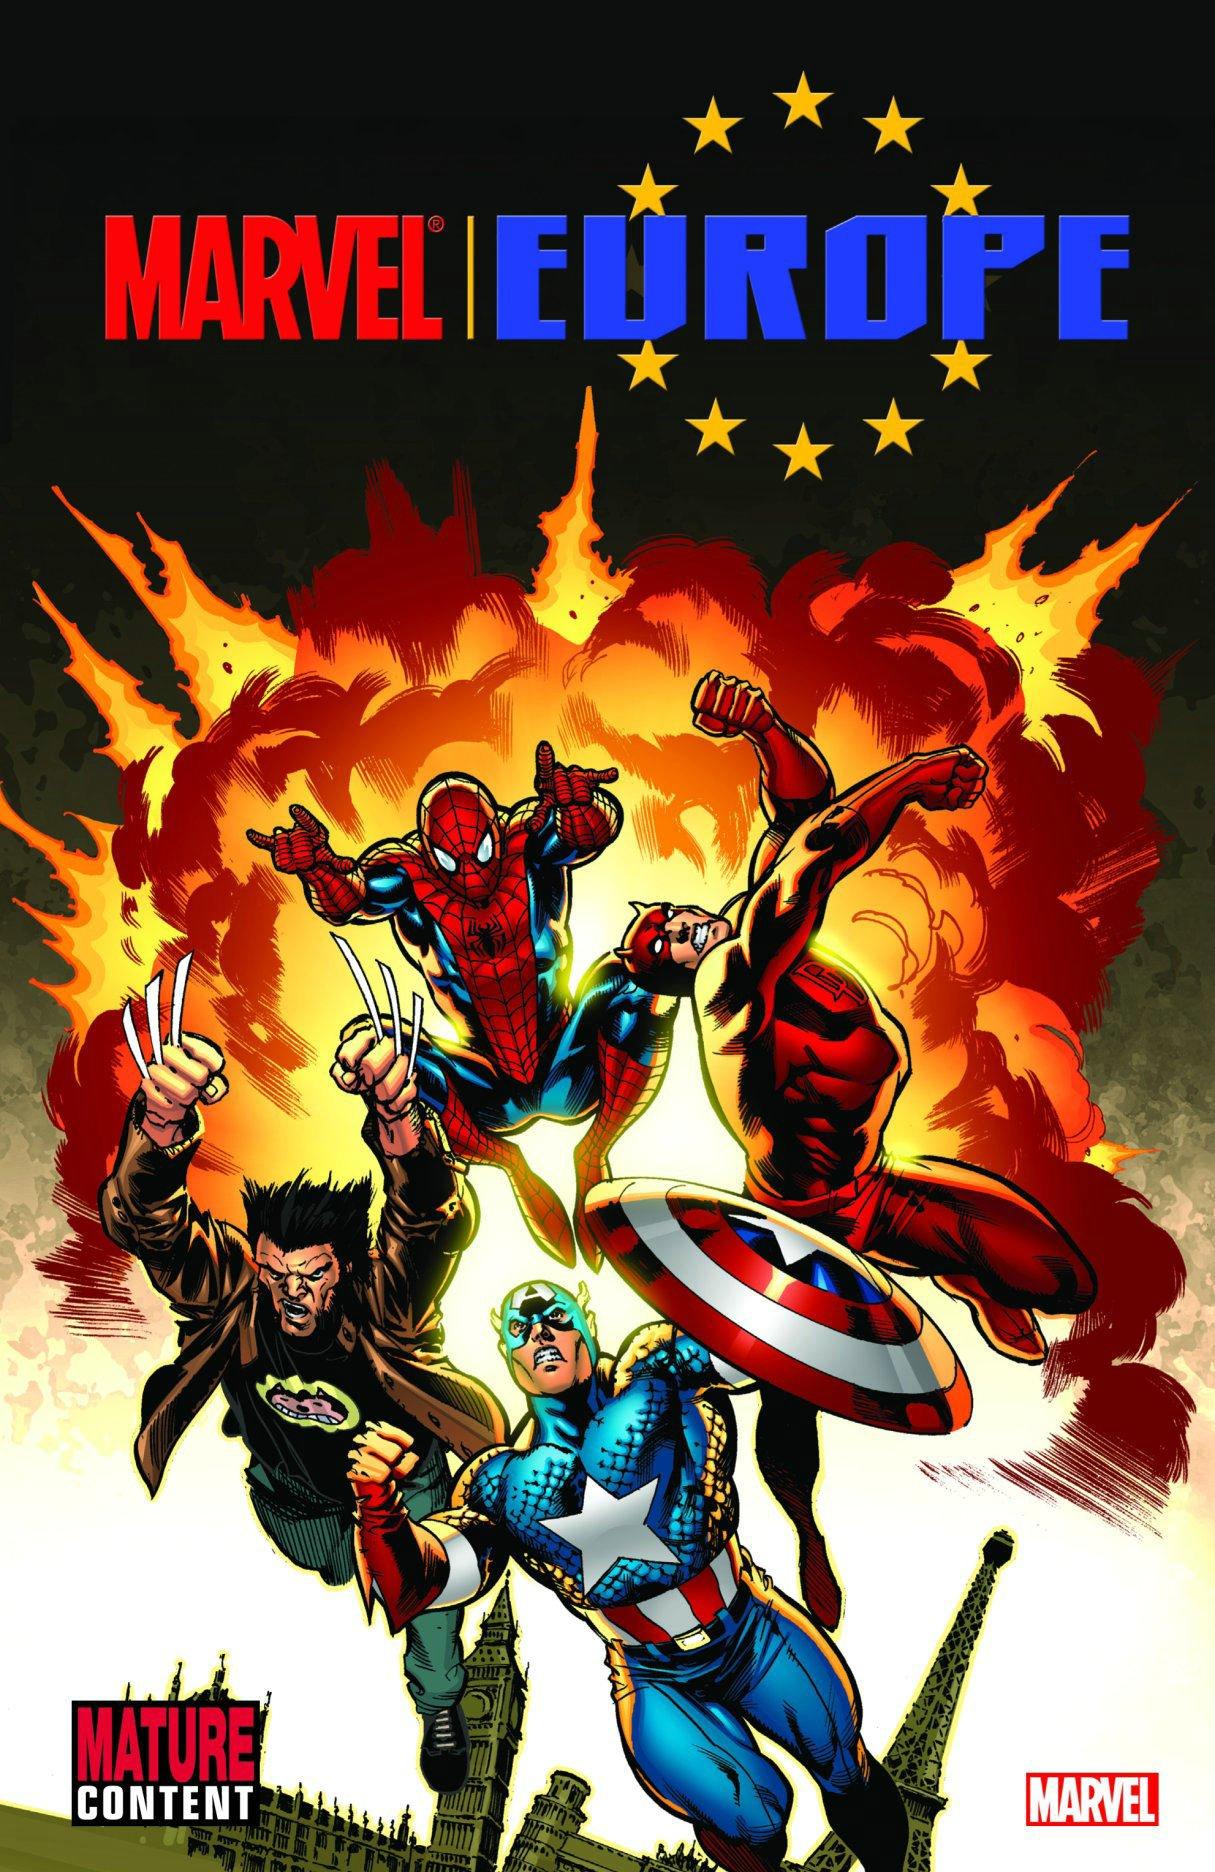 Marvel Europe